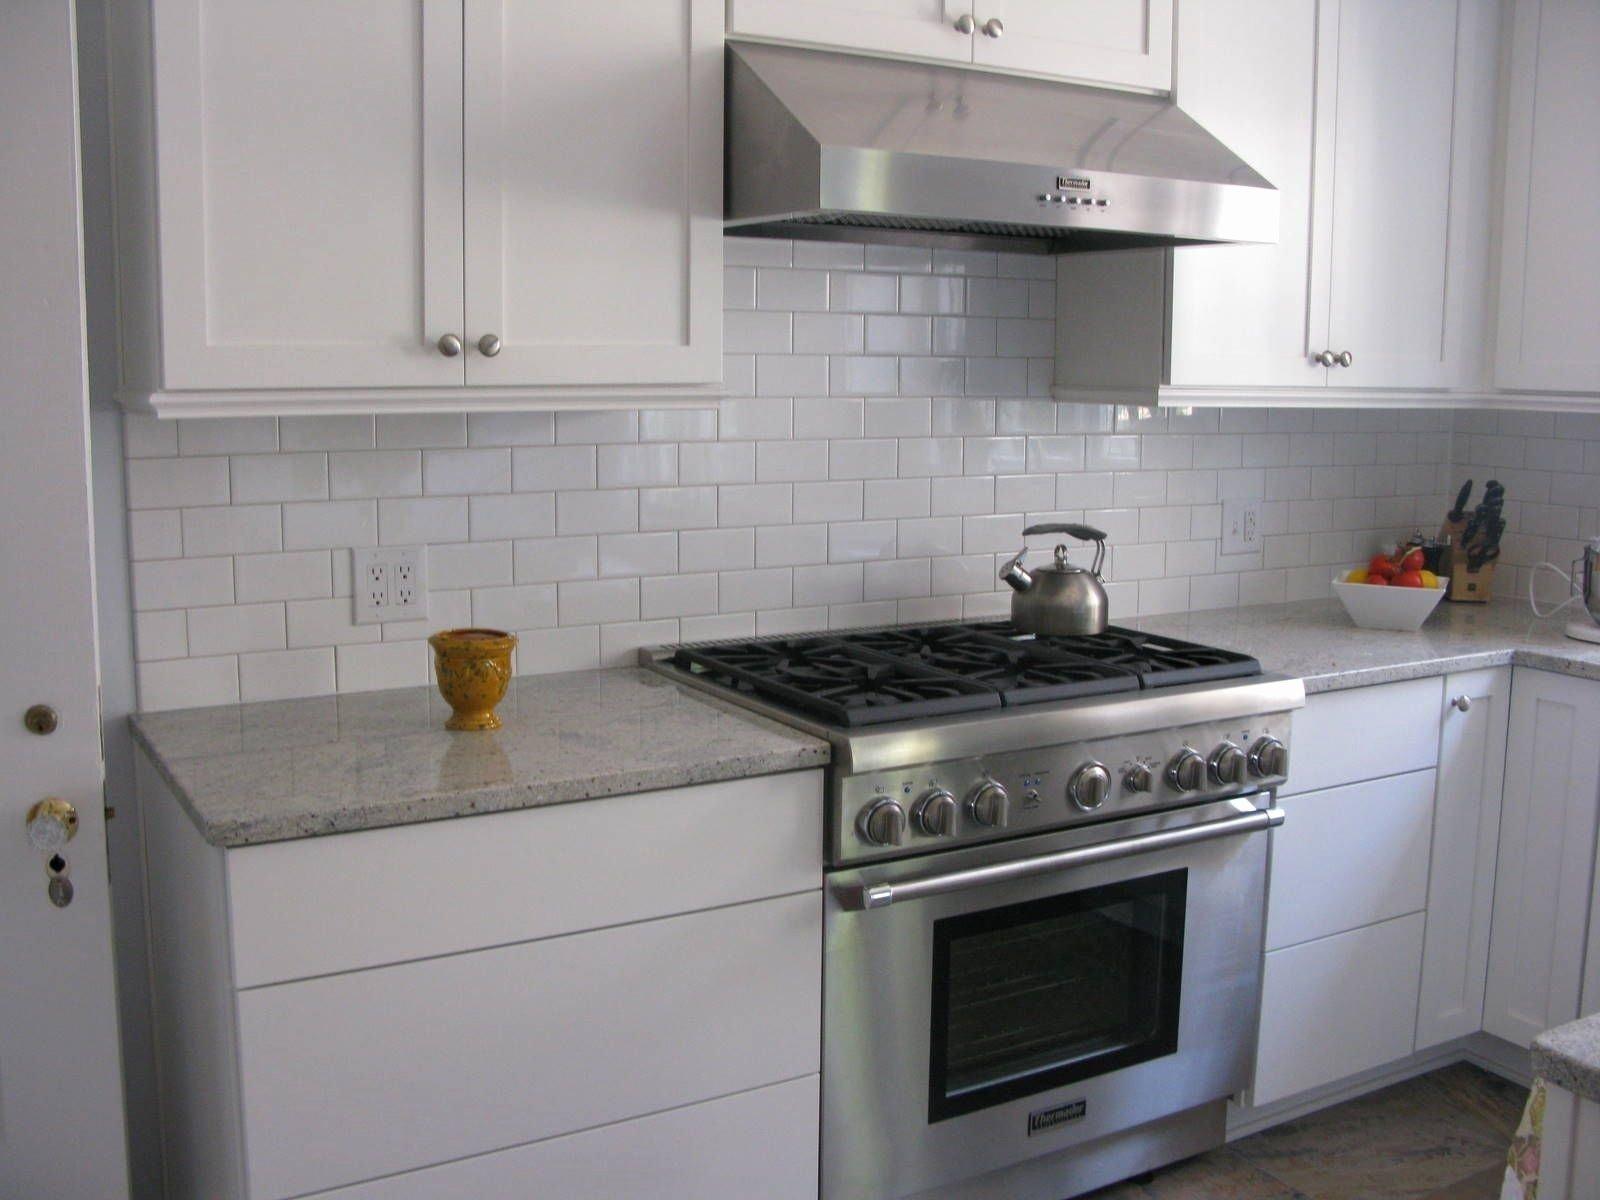 10 Gorgeous Subway Tile Kitchen Backsplash Ideas home depot kitchen tile backsplash ideas lovely grey glass subway 2020